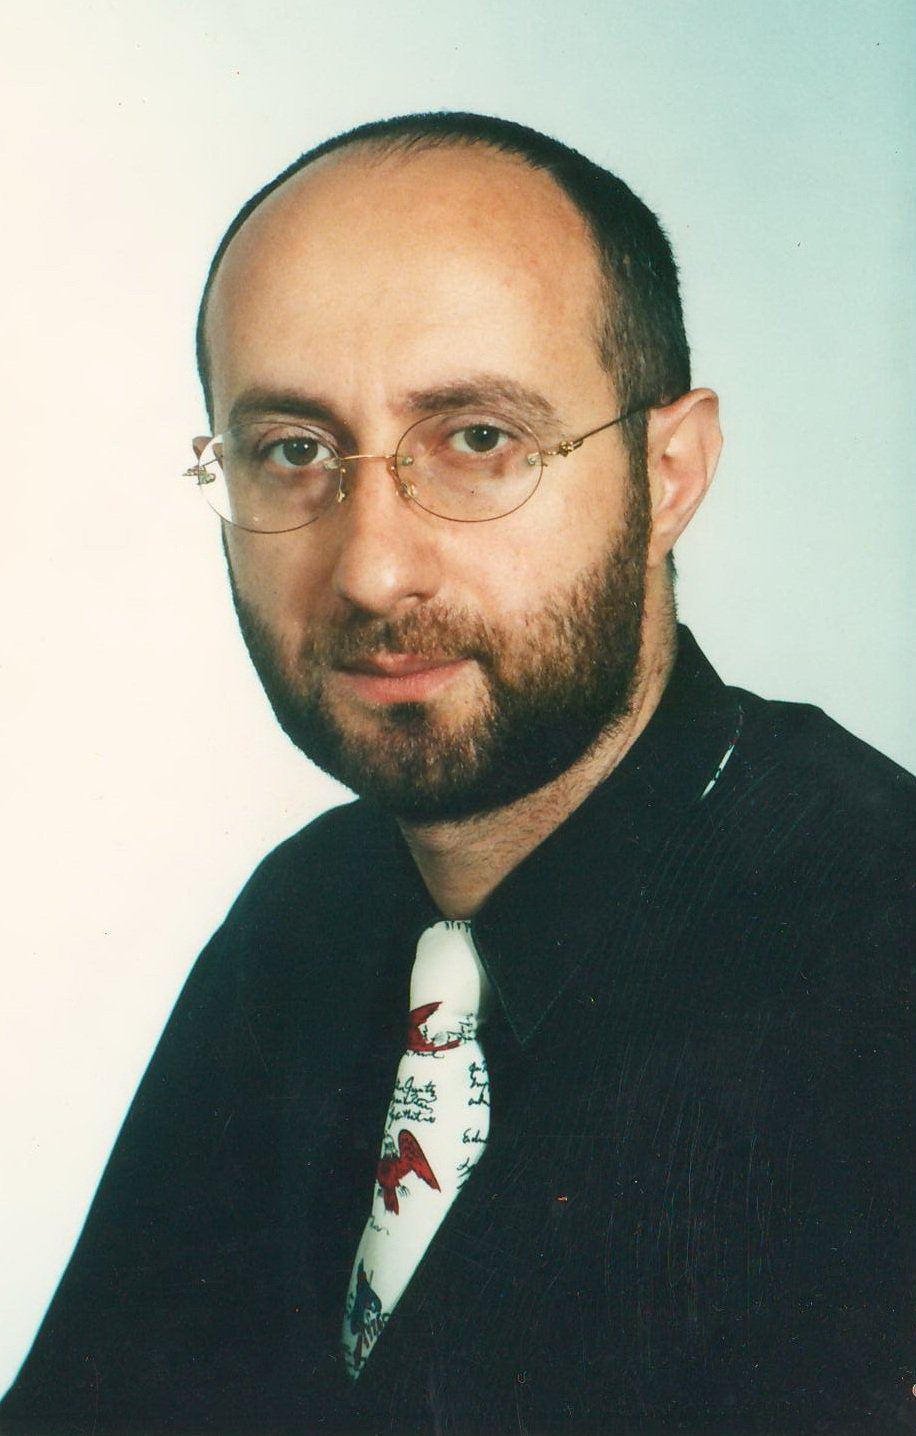 фото Автандил Бежиашвили